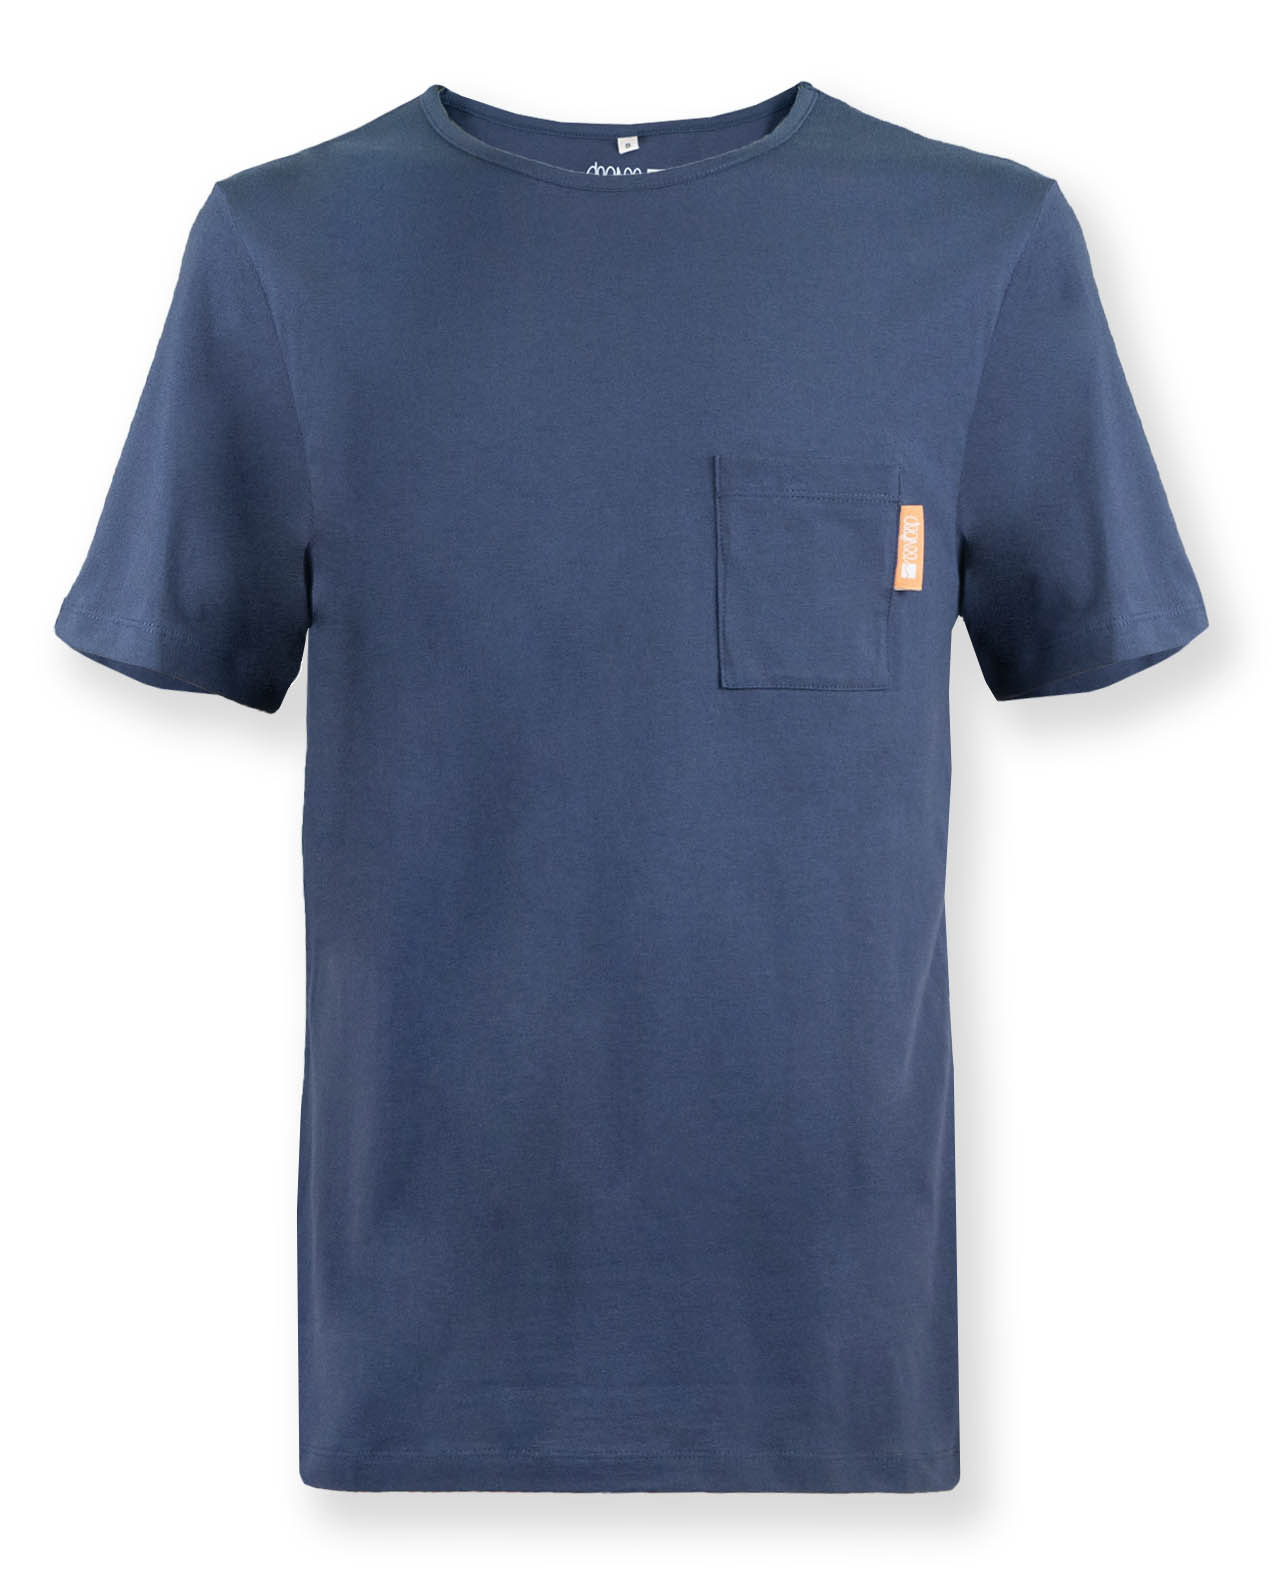 brutus shirter, blau, herren - degree